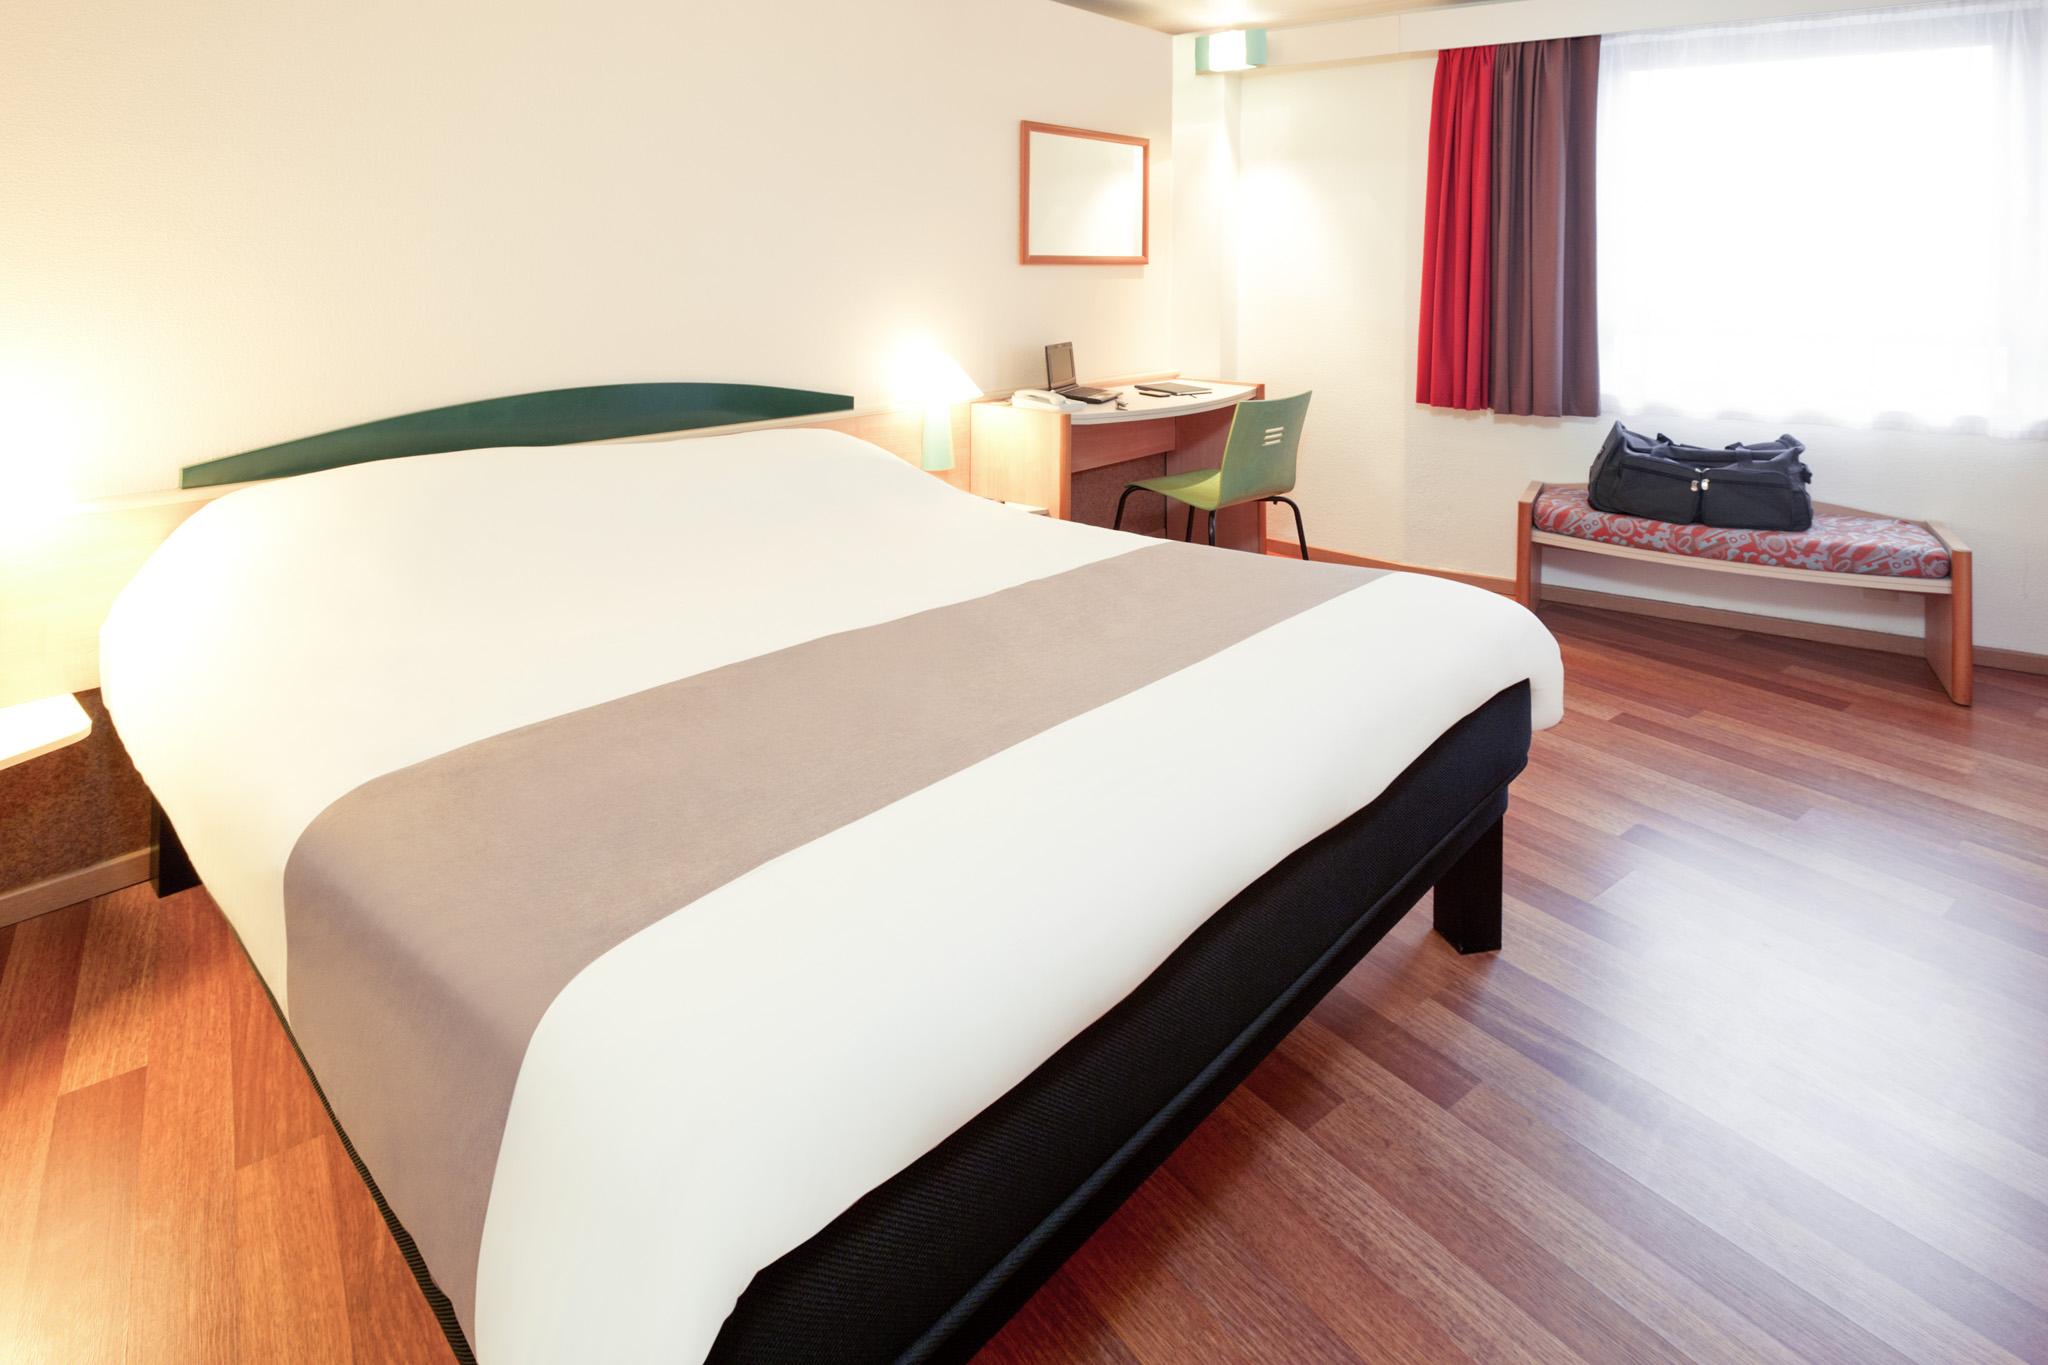 Ibis Hotel Room Facilities